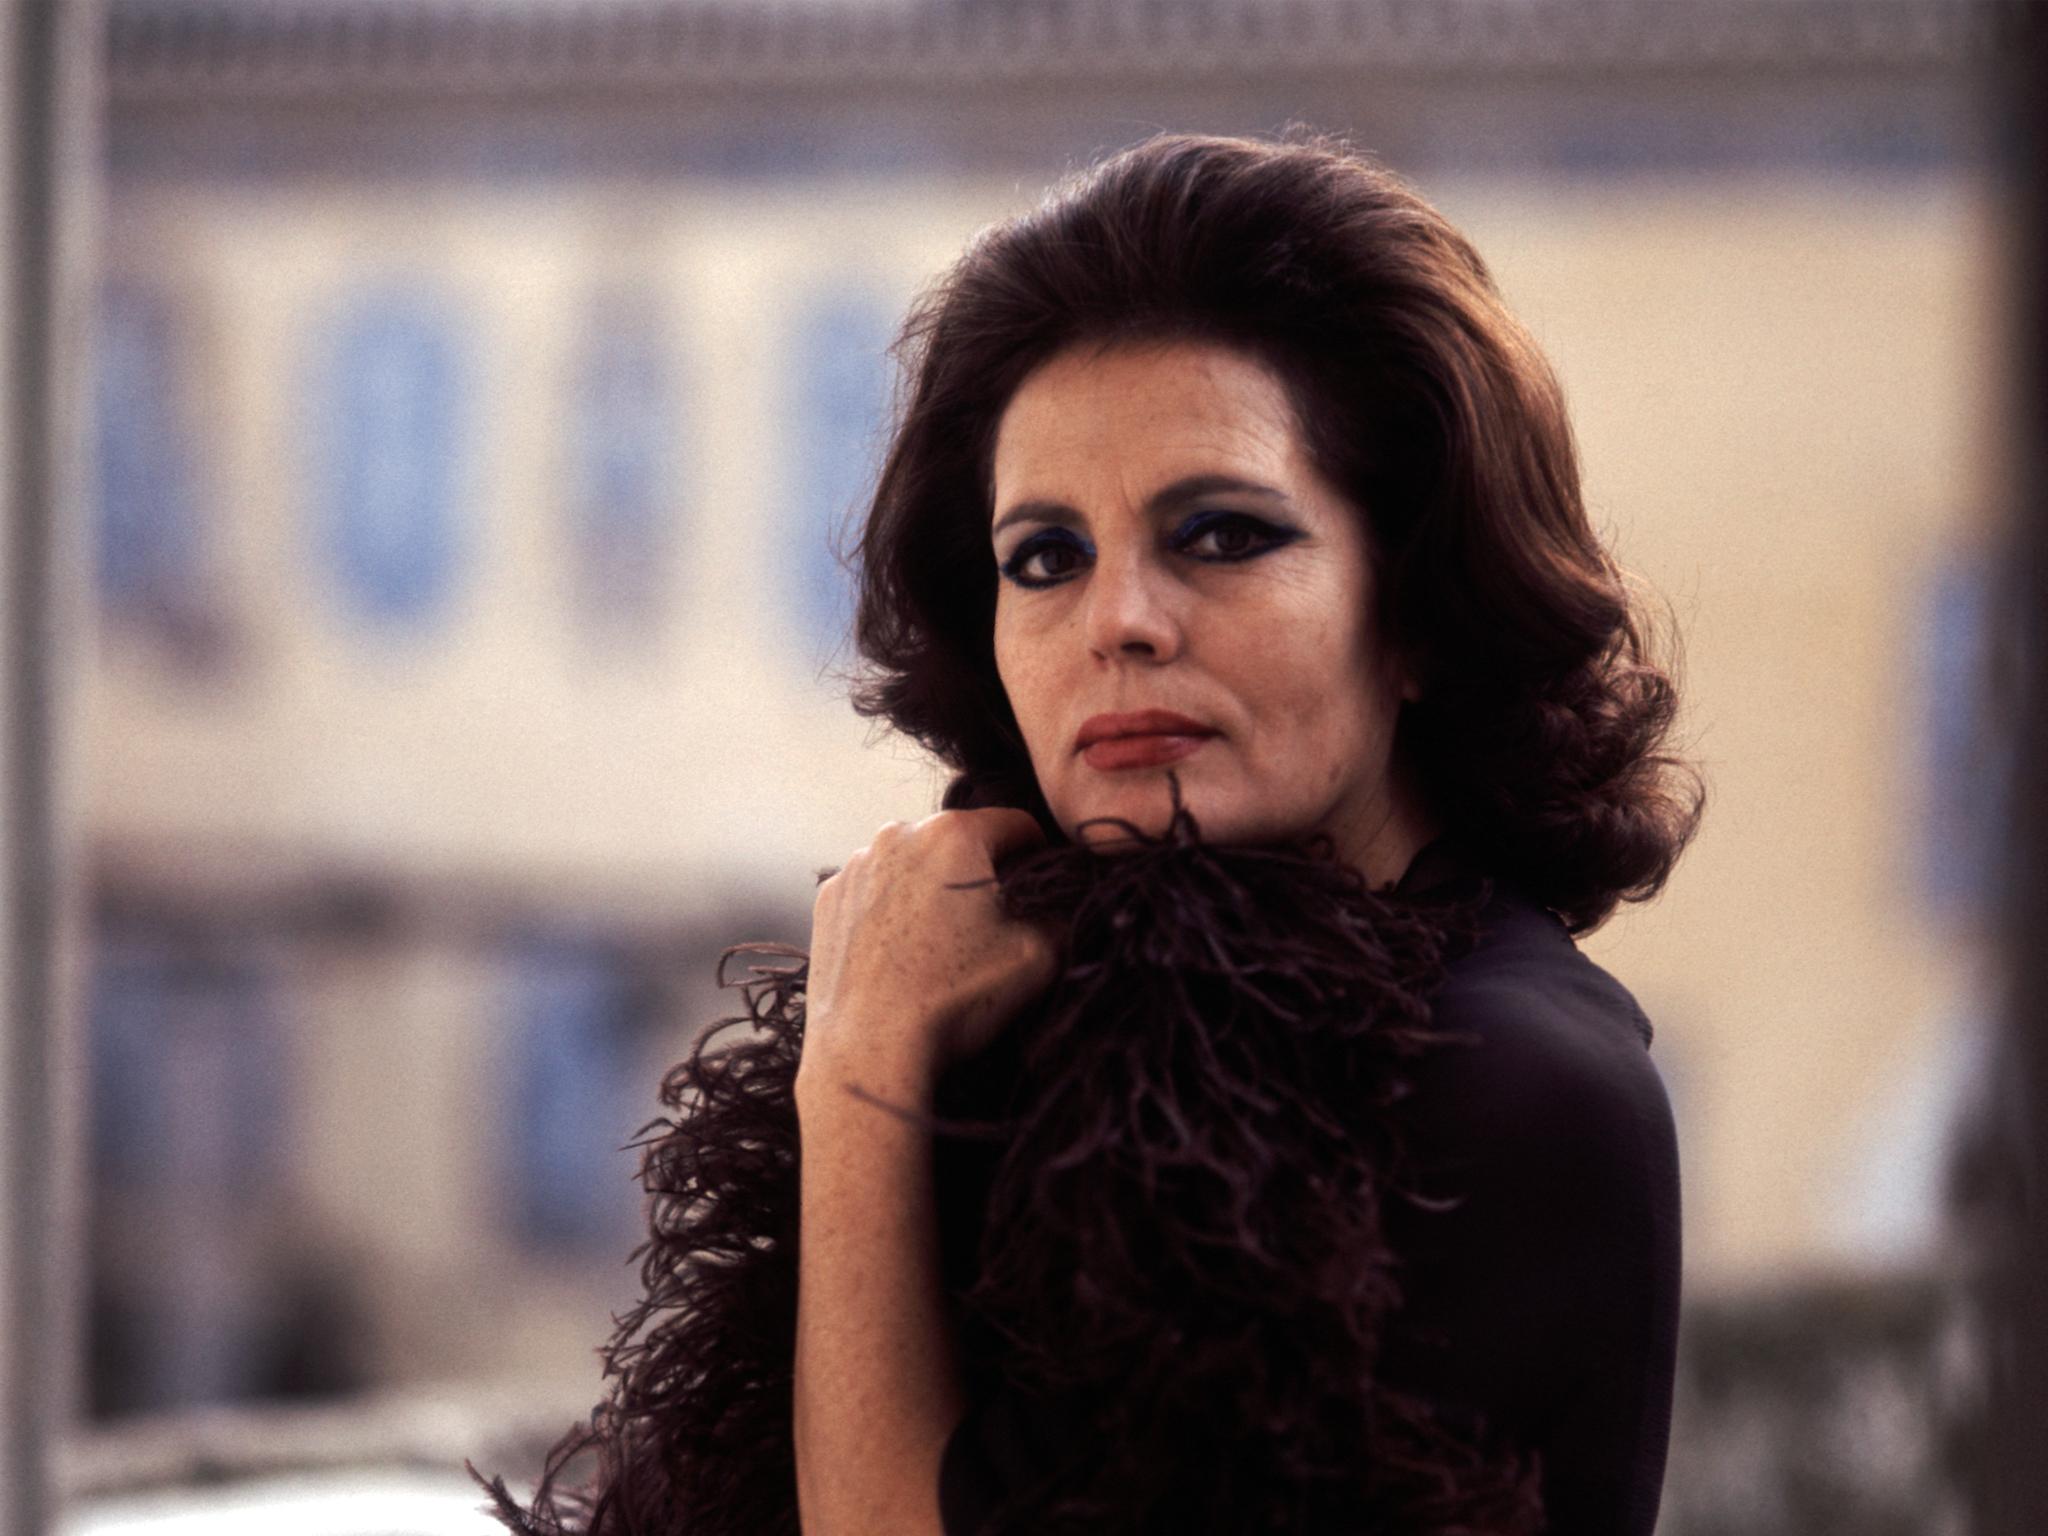 amália 1970's